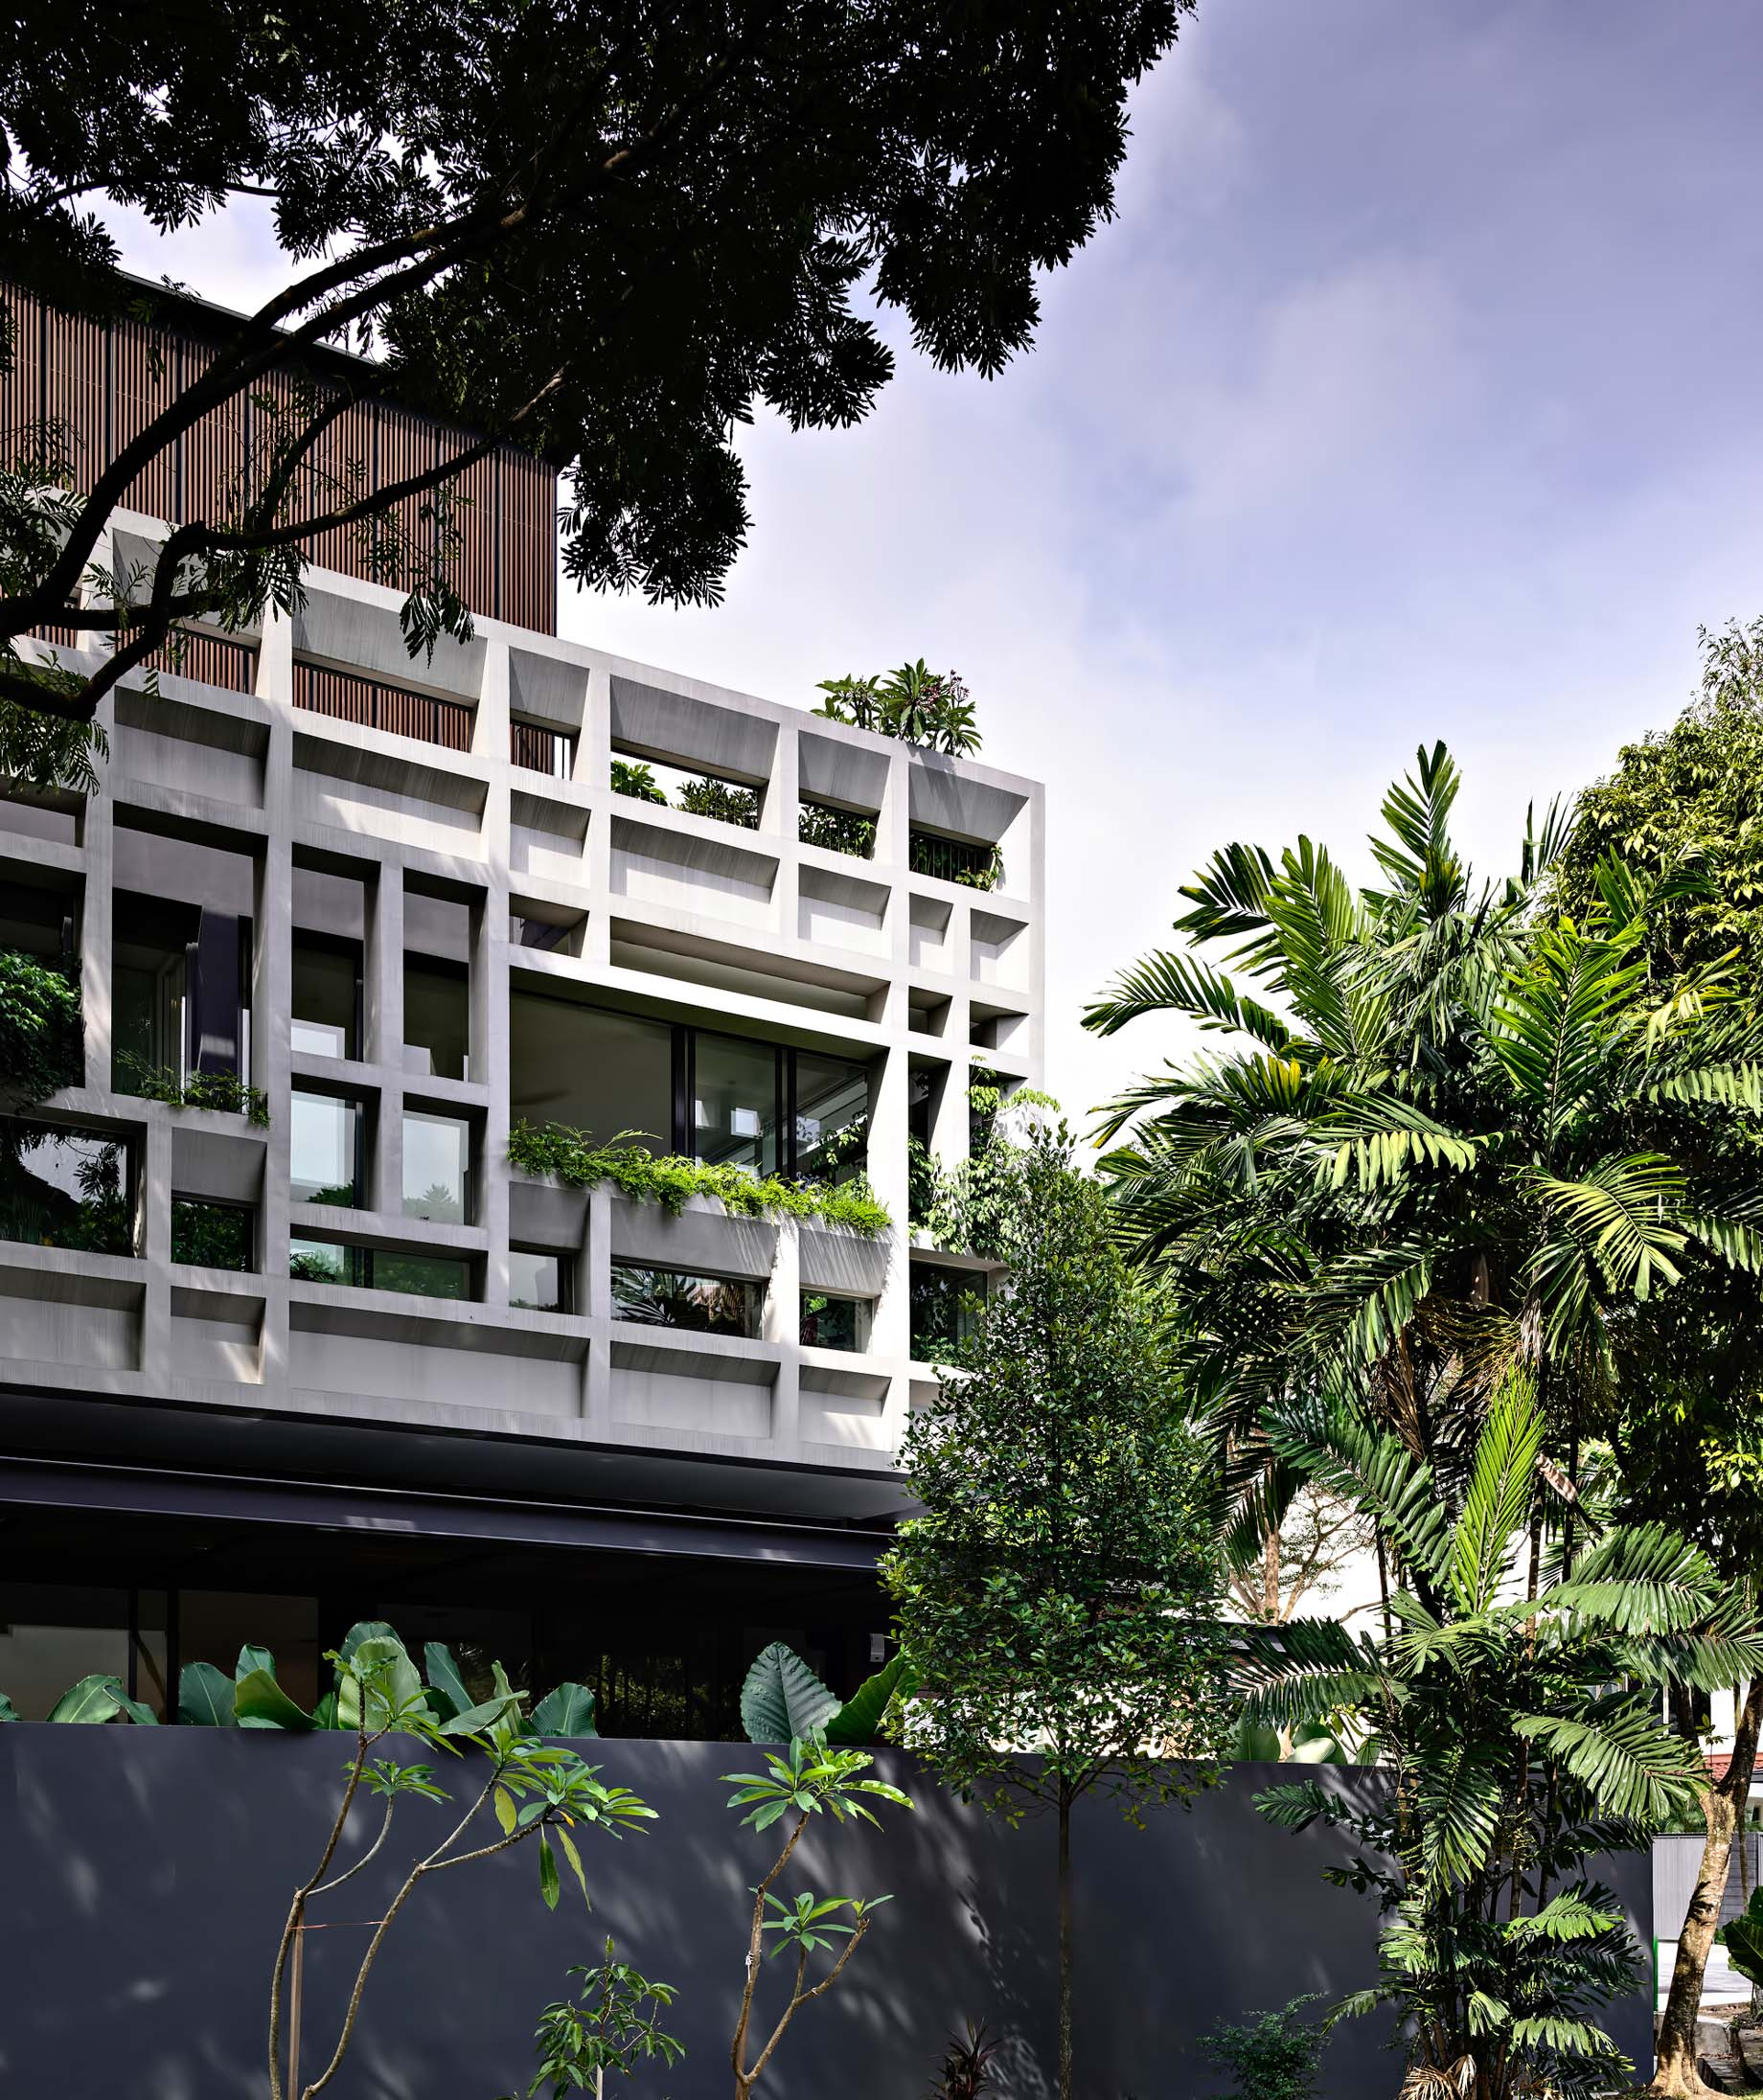 Verdant Verandah Luxury House – Princess of Wales Rd, Singapore